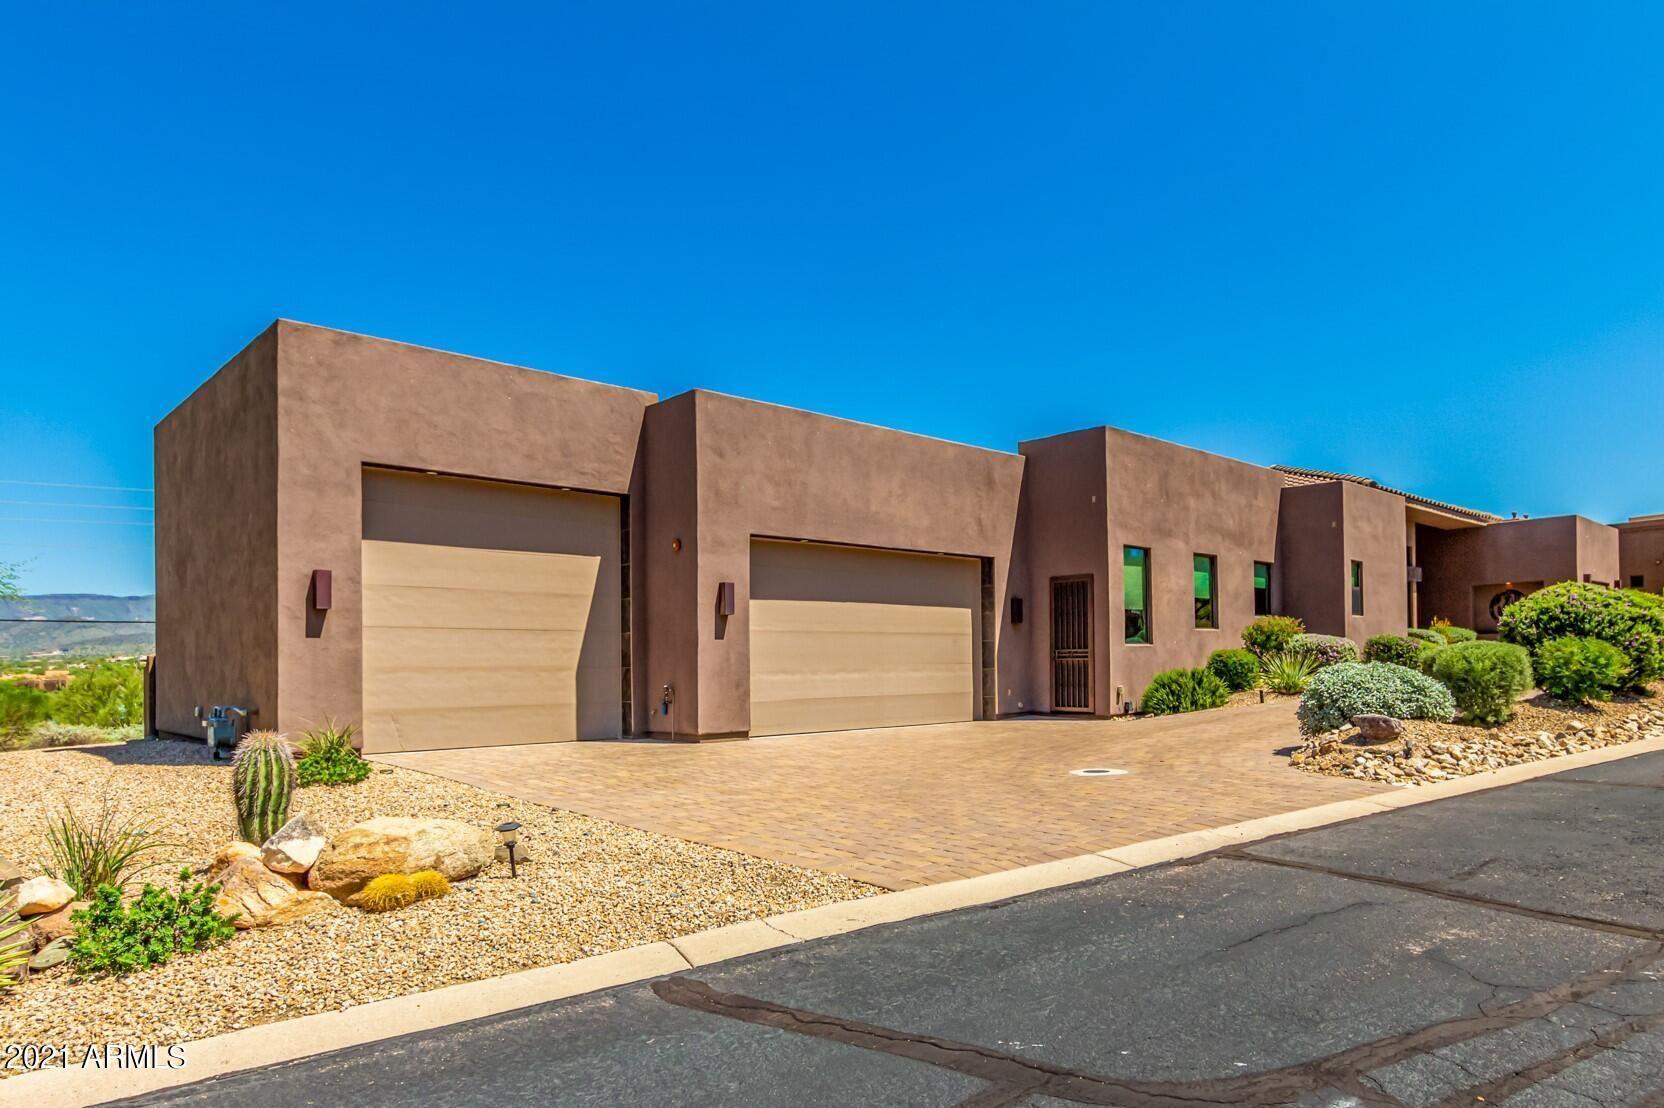 Photo of 7112 E RIDGEVIEW Lane, Carefree, AZ 85377 (MLS # 6285593)